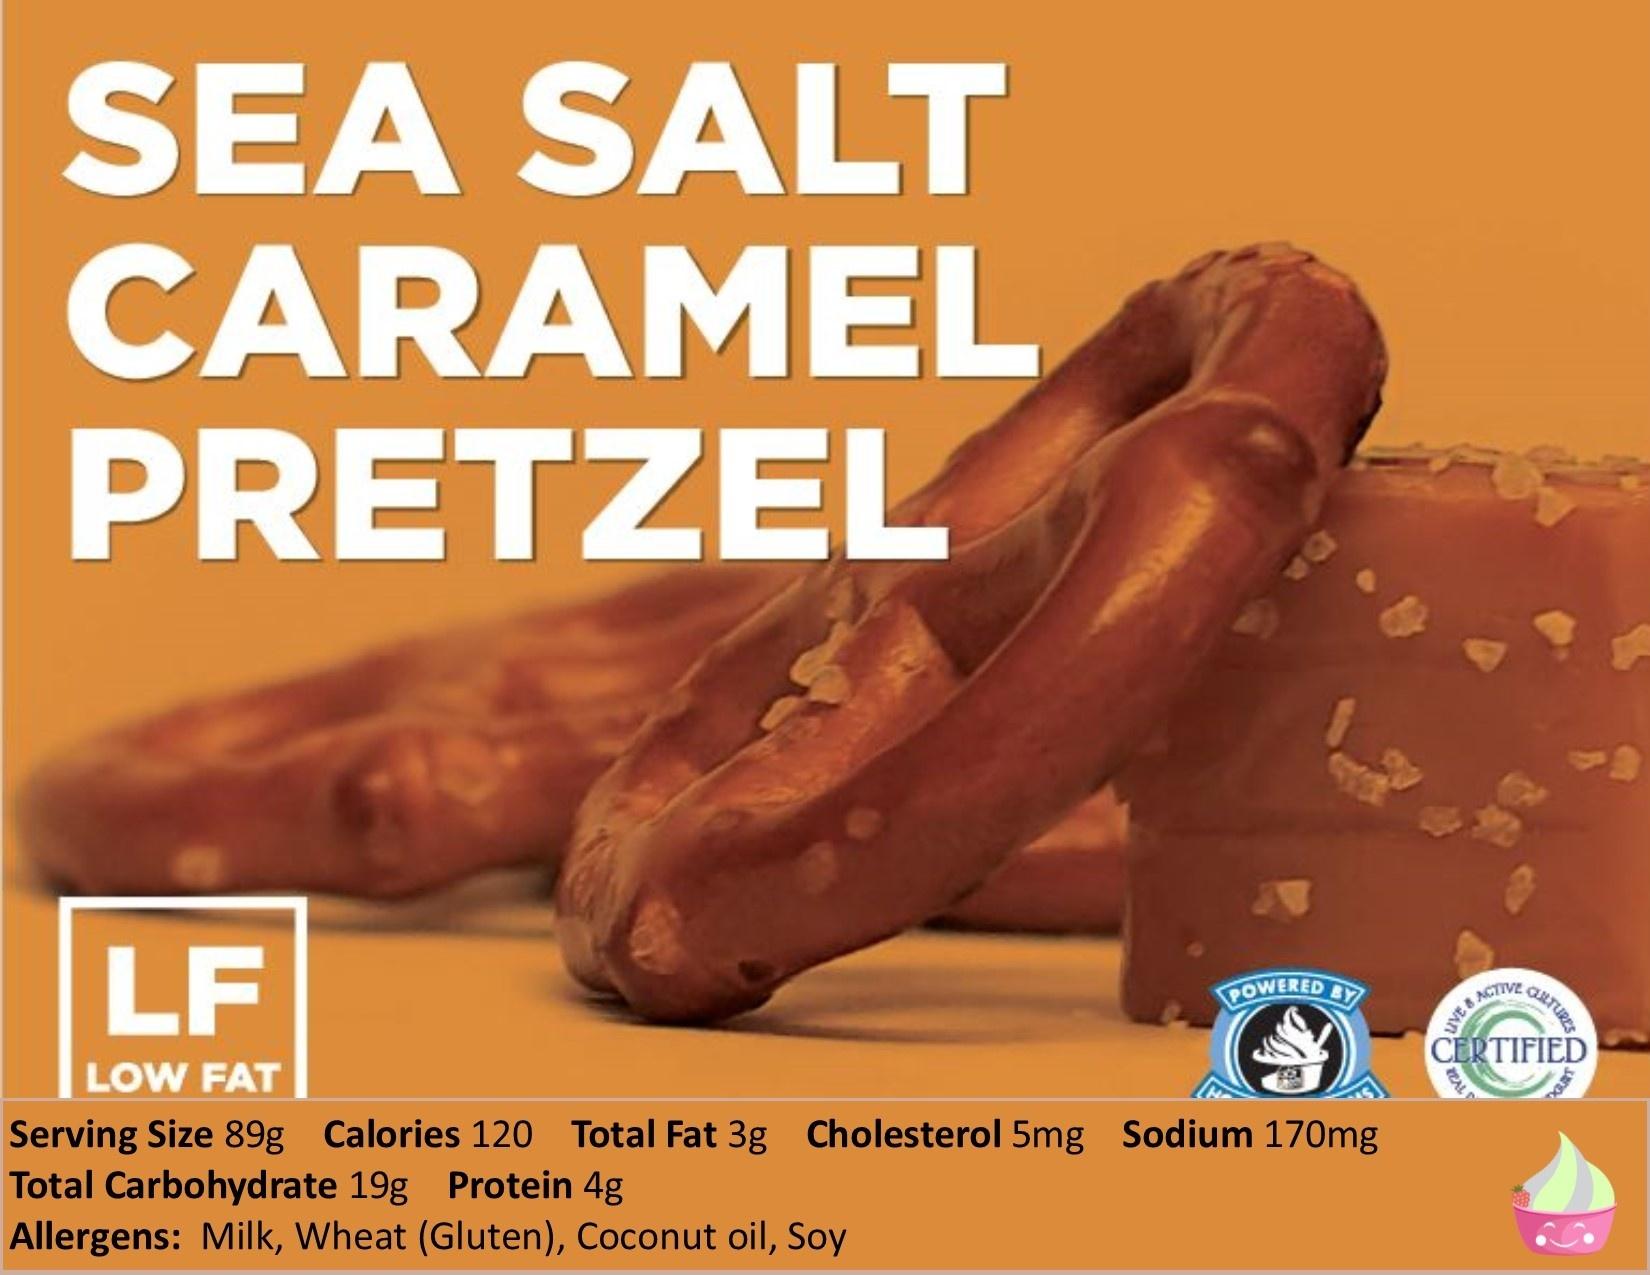 https://0201.nccdn.net/1_2/000/000/180/8ec/Sea-Salt-Caramel-Pretzel-LF-1650x1275-1650x1275.jpg